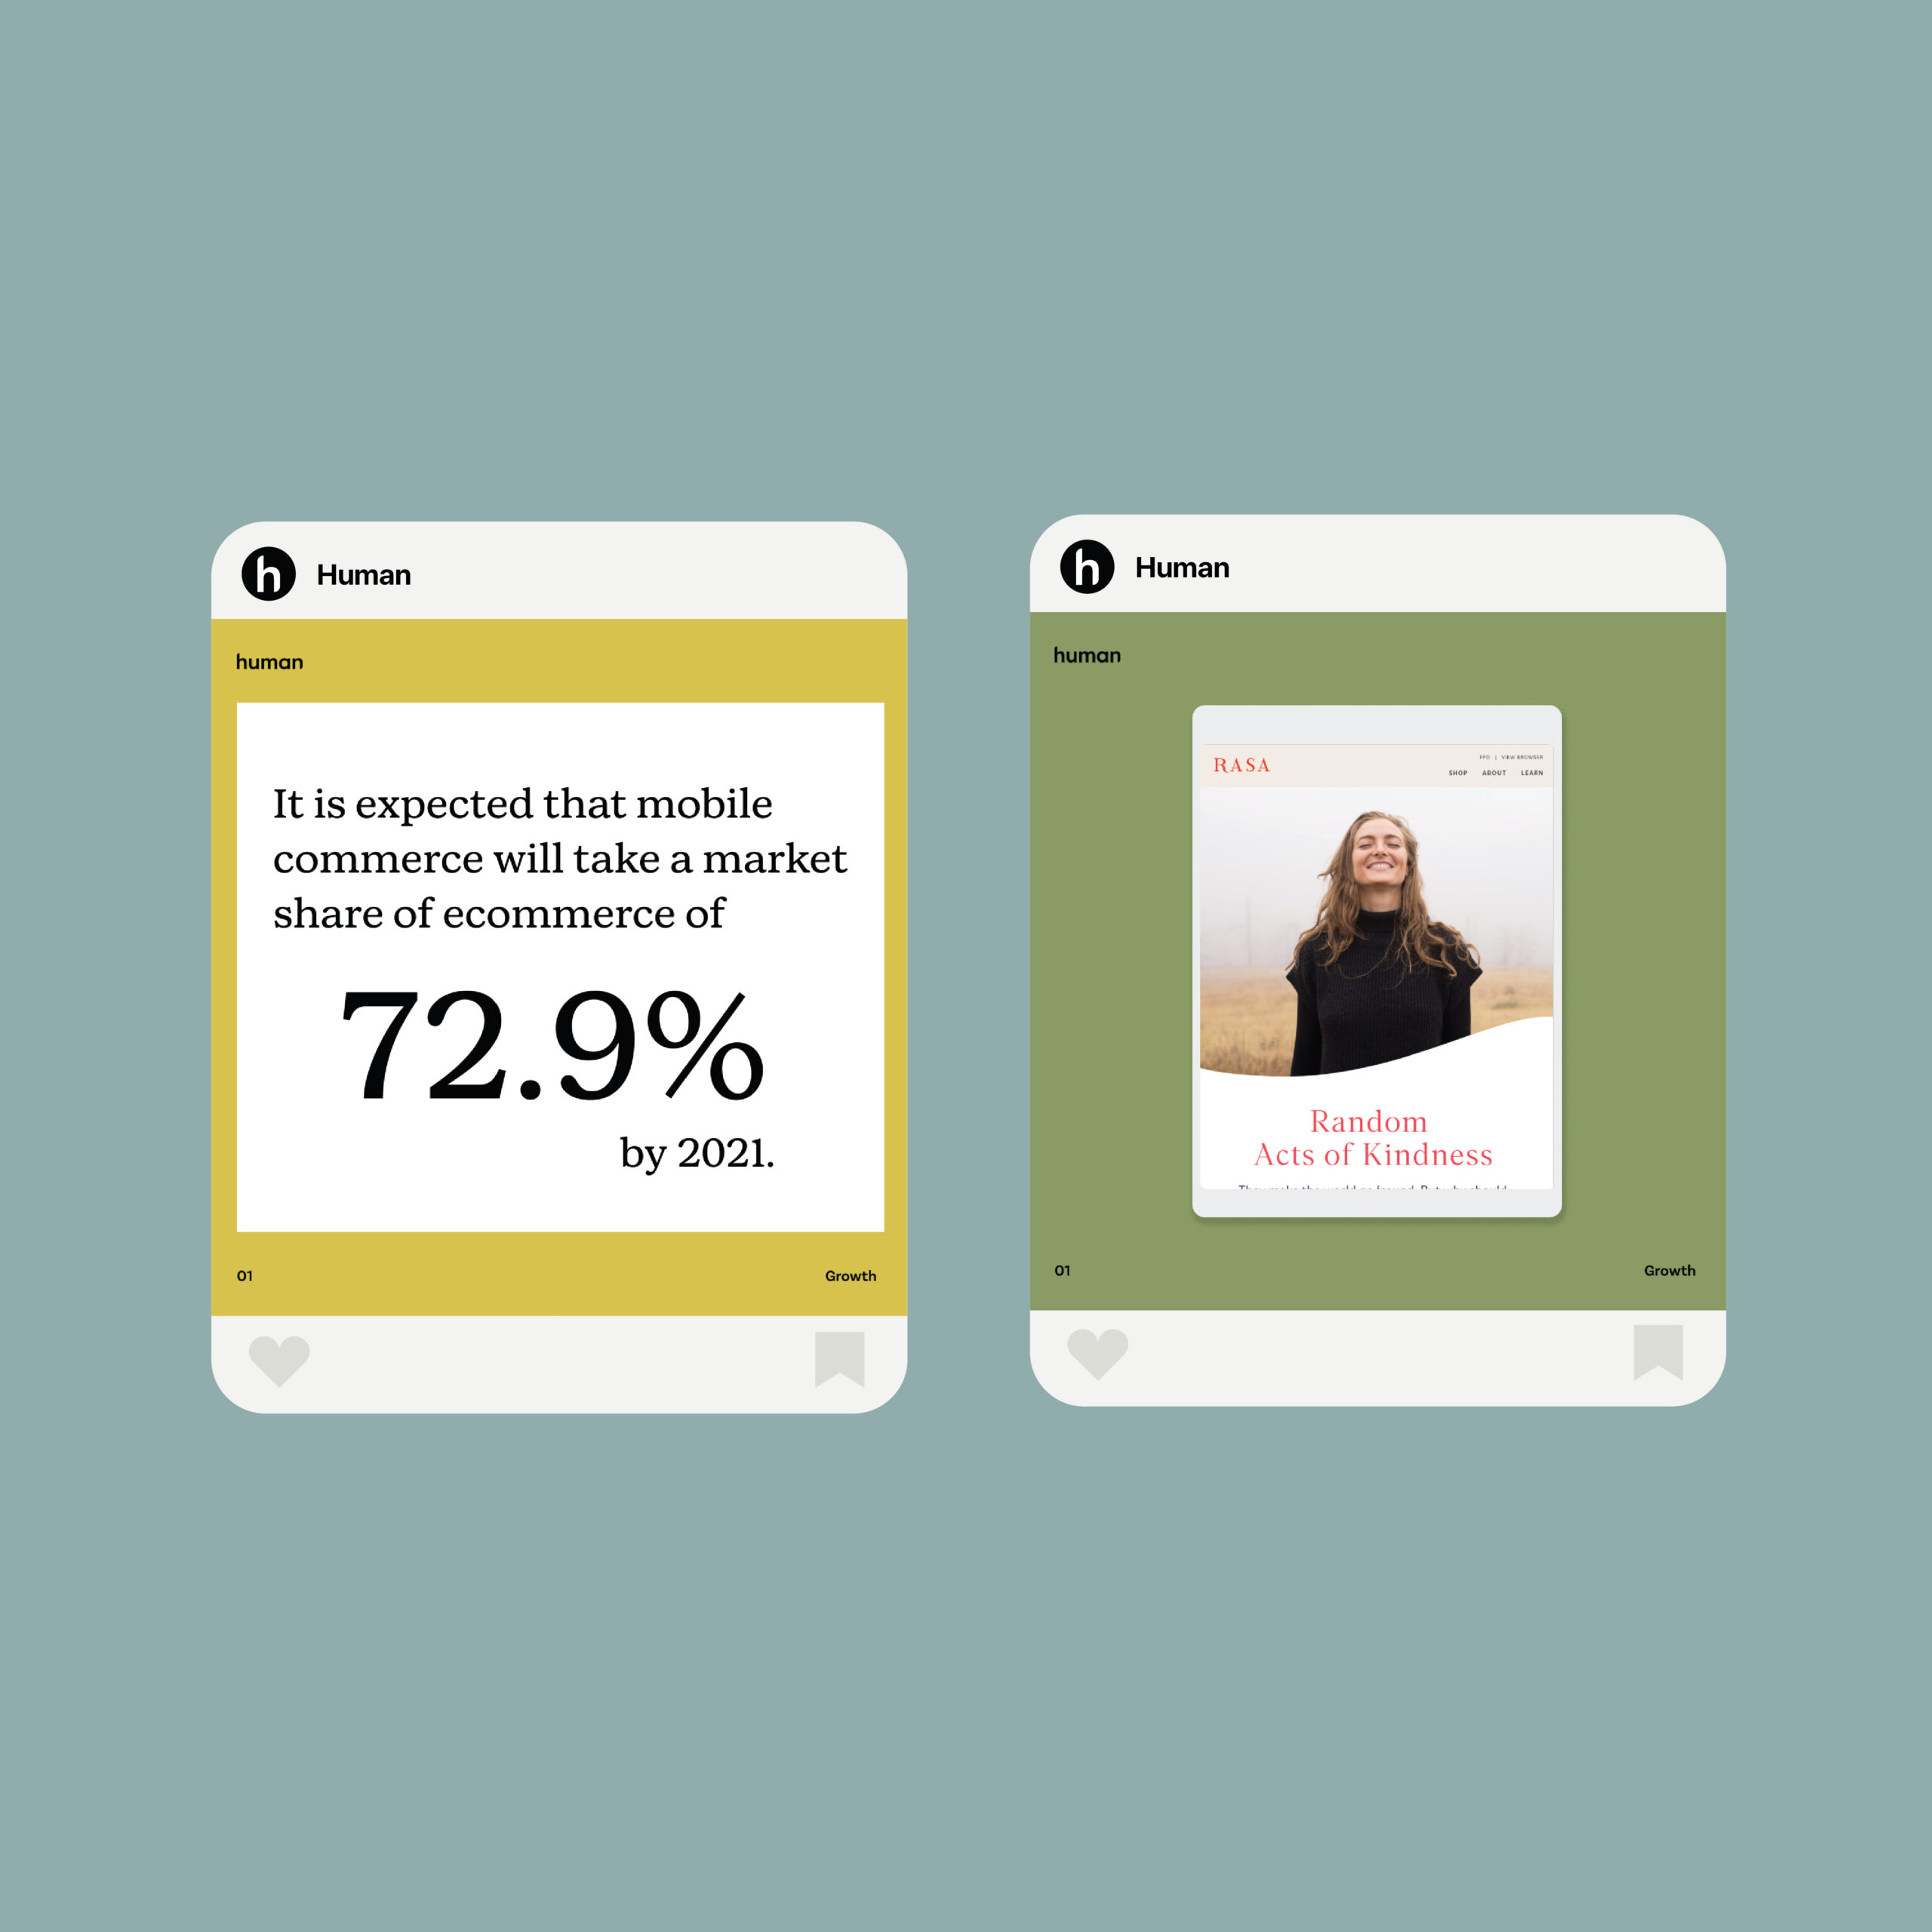 Human_Branding_By_Stellen_Design_Social Media